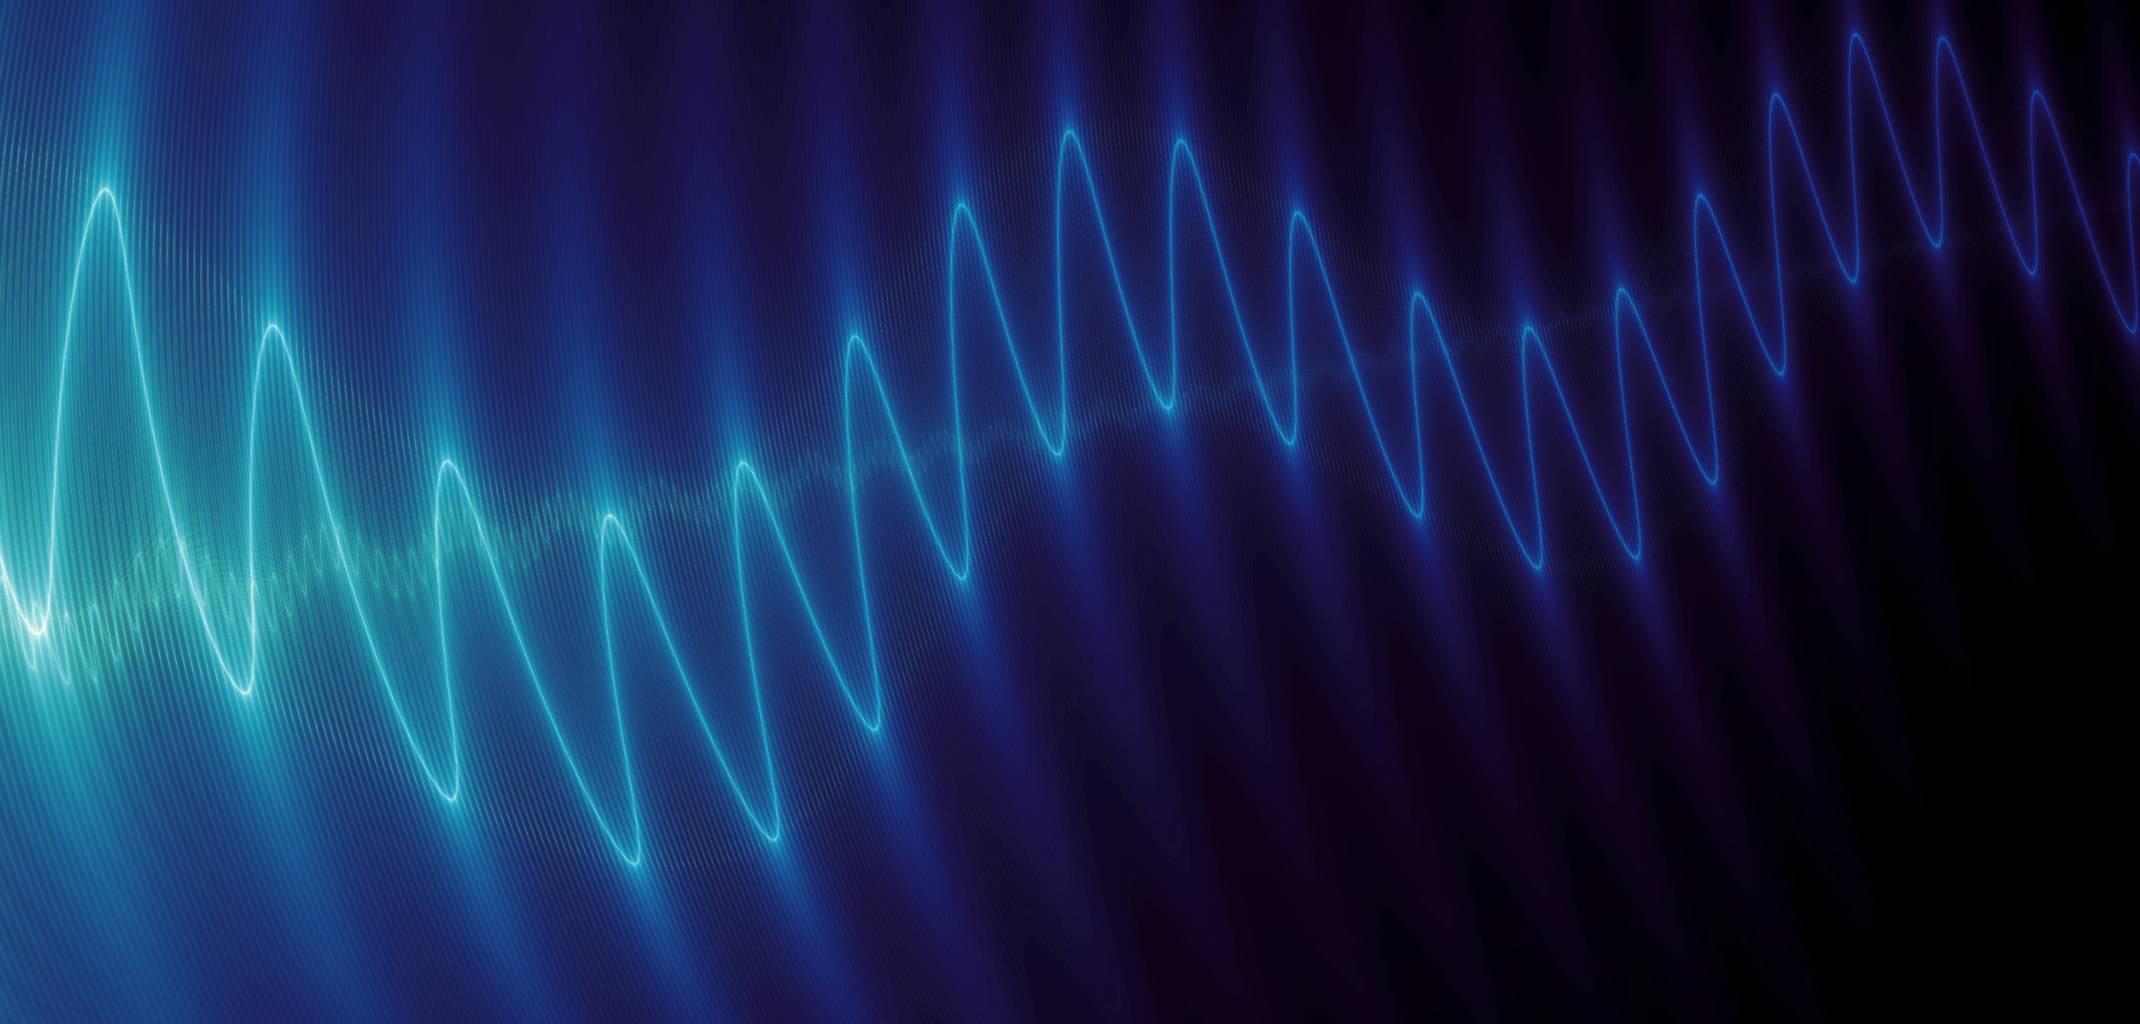 Electronic Music Wave Wallpaper   www.pixshark.com ...